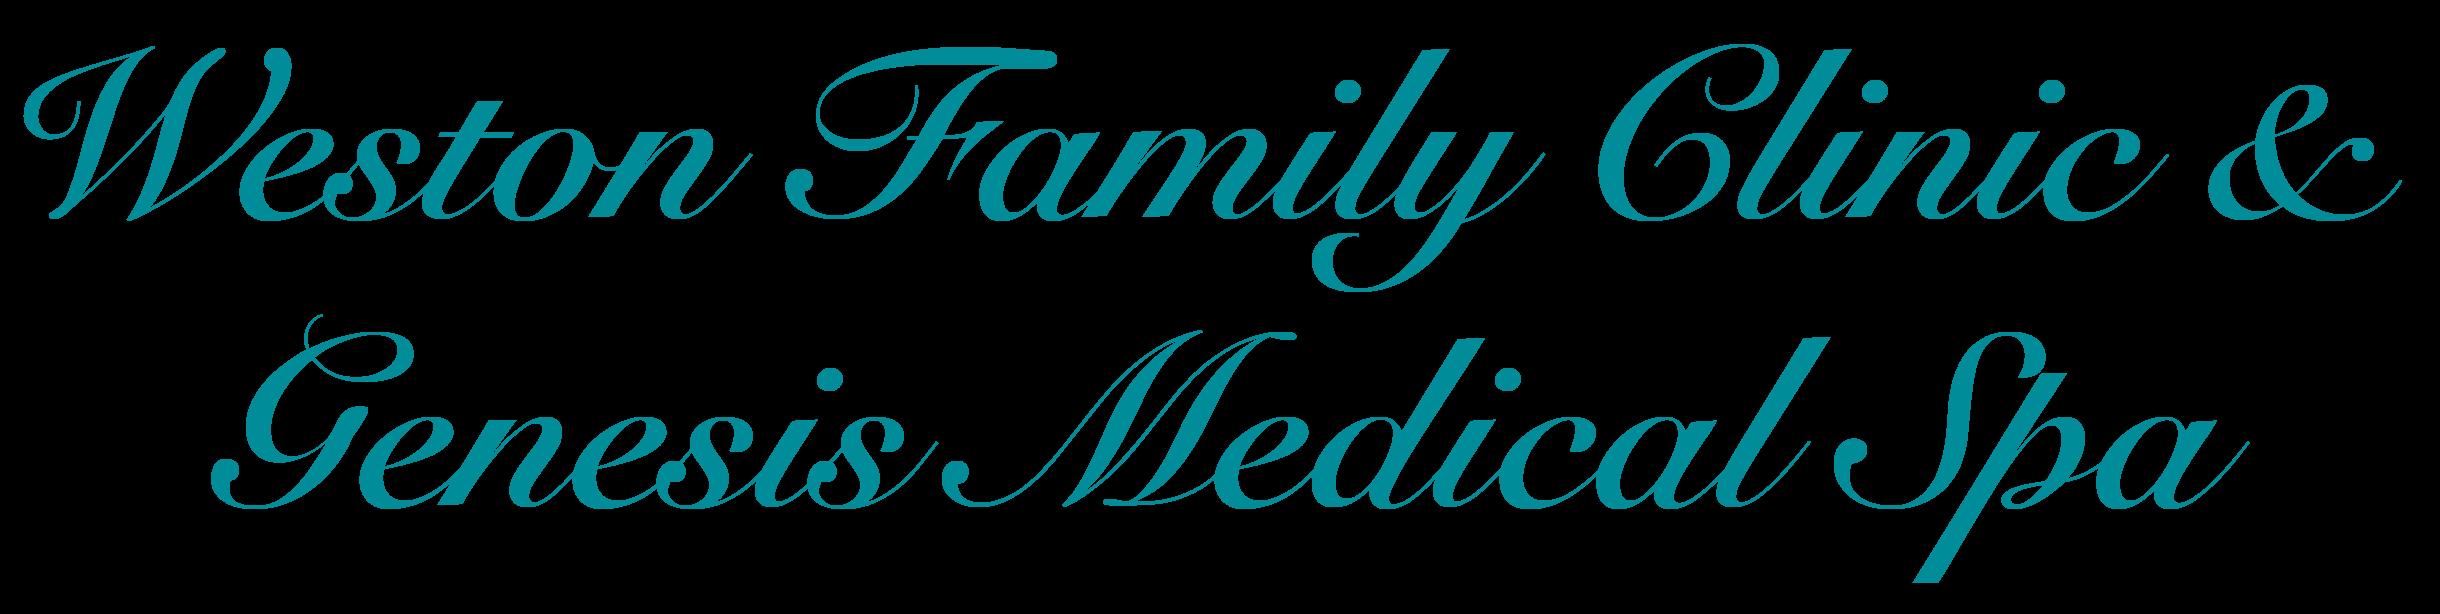 Weston-Family-Clinic-Genesis-Medical-Spa